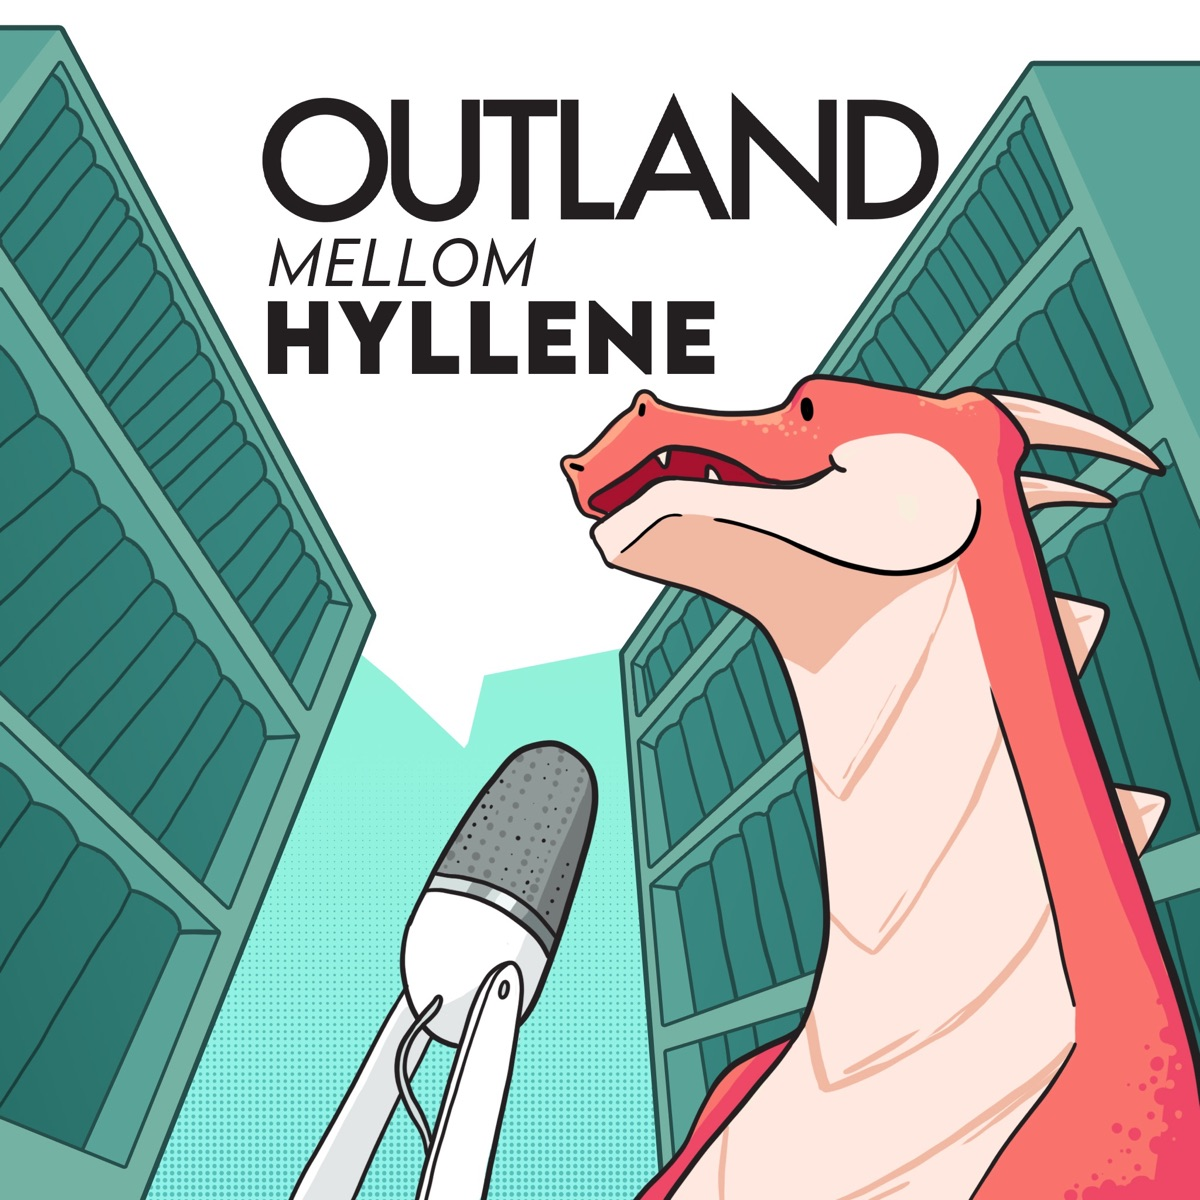 Outland Mellom Hyllene